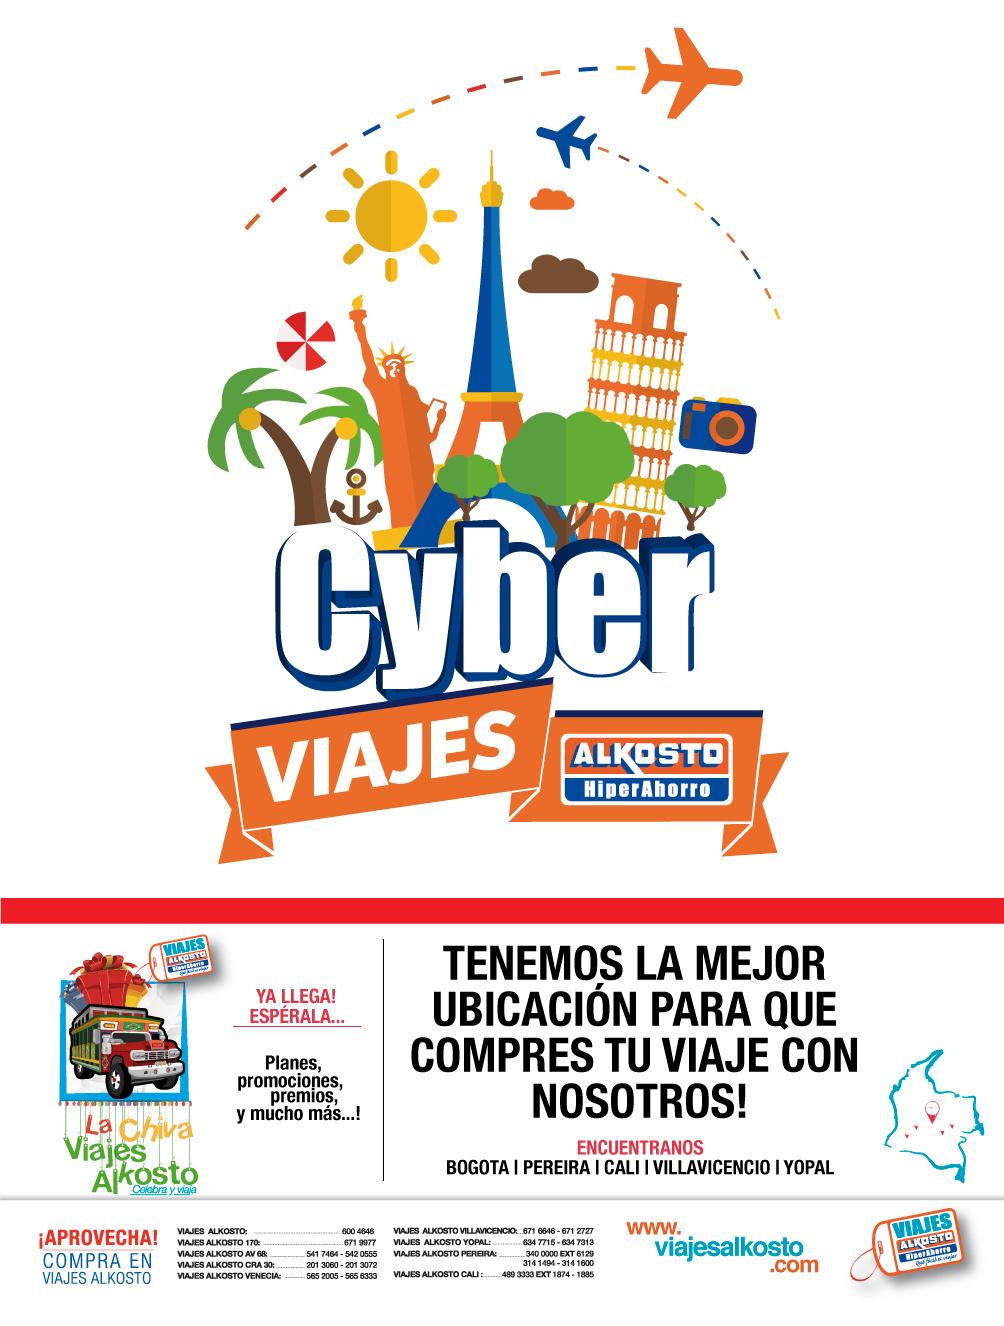 Cyber-viajesalkosto